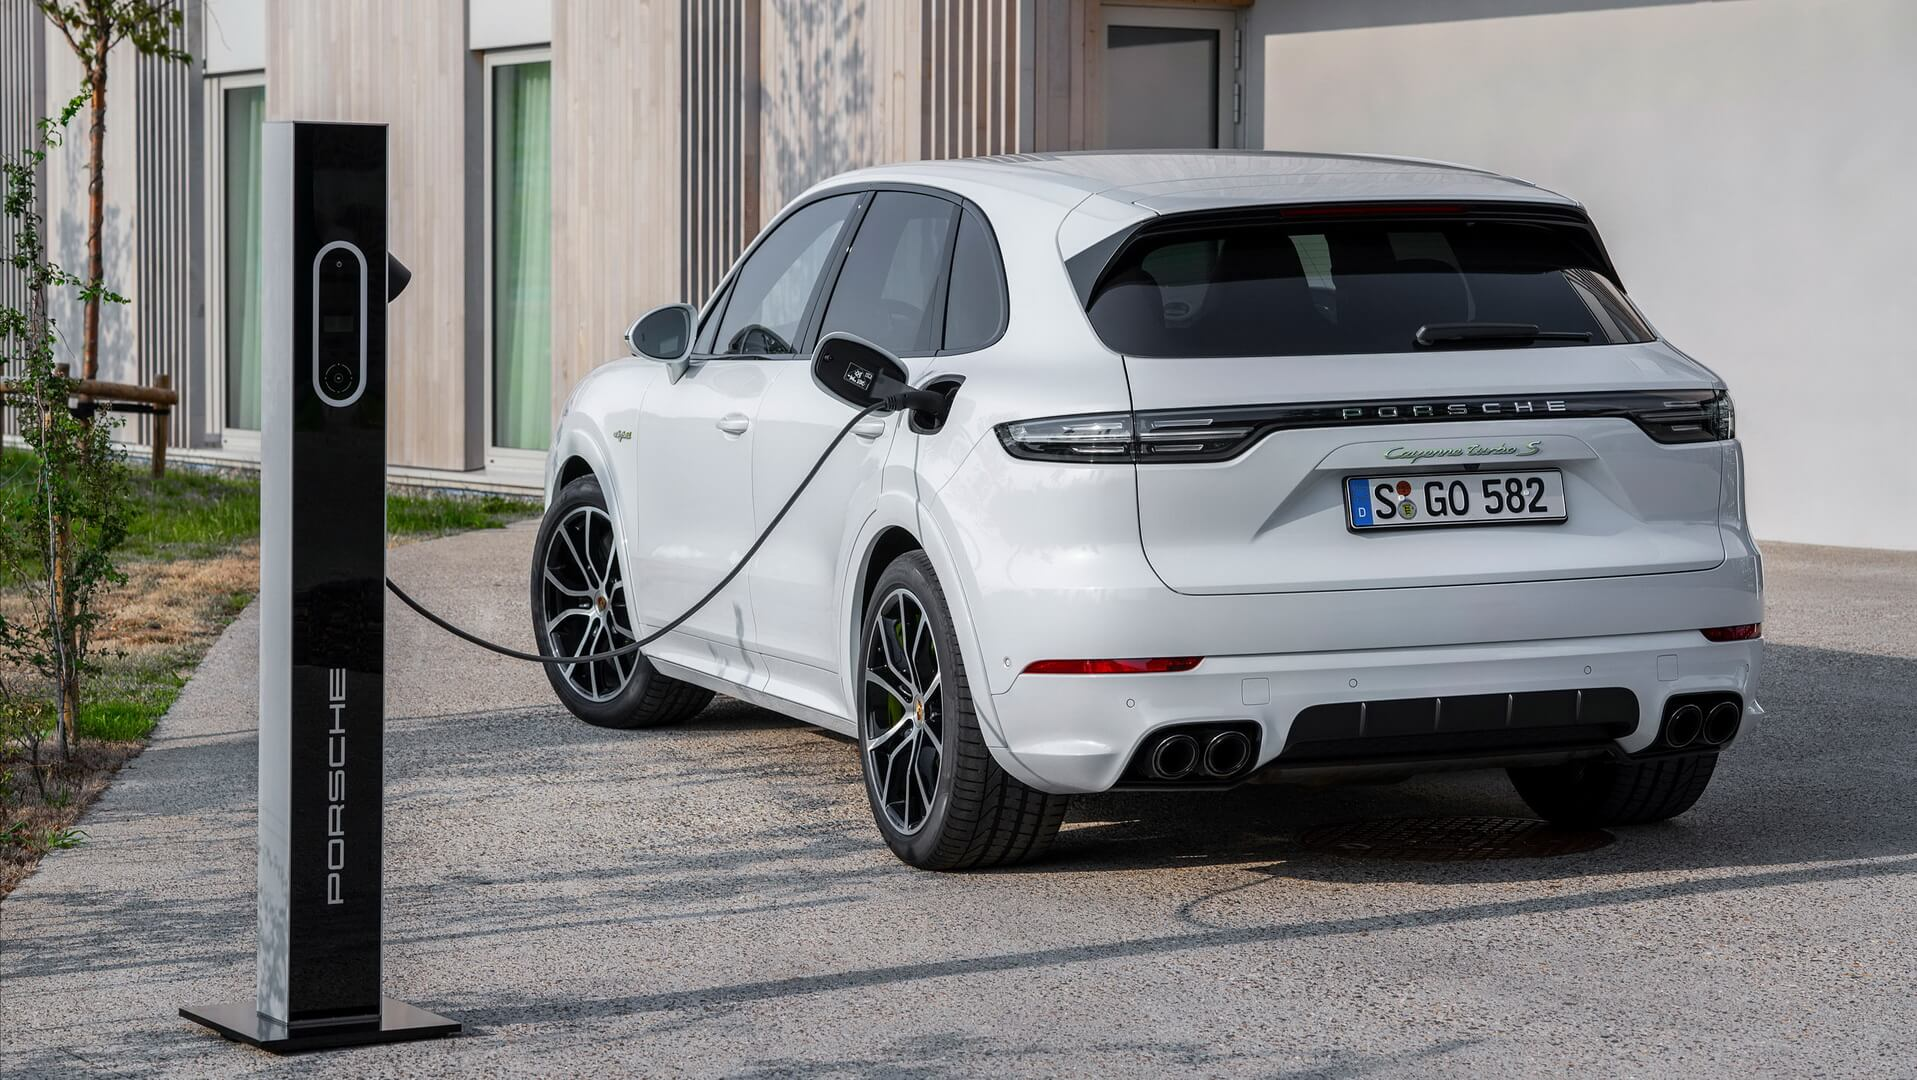 Новый плагин-гибридный флагман Porsche Cayenne Turbo S E-Hybrid